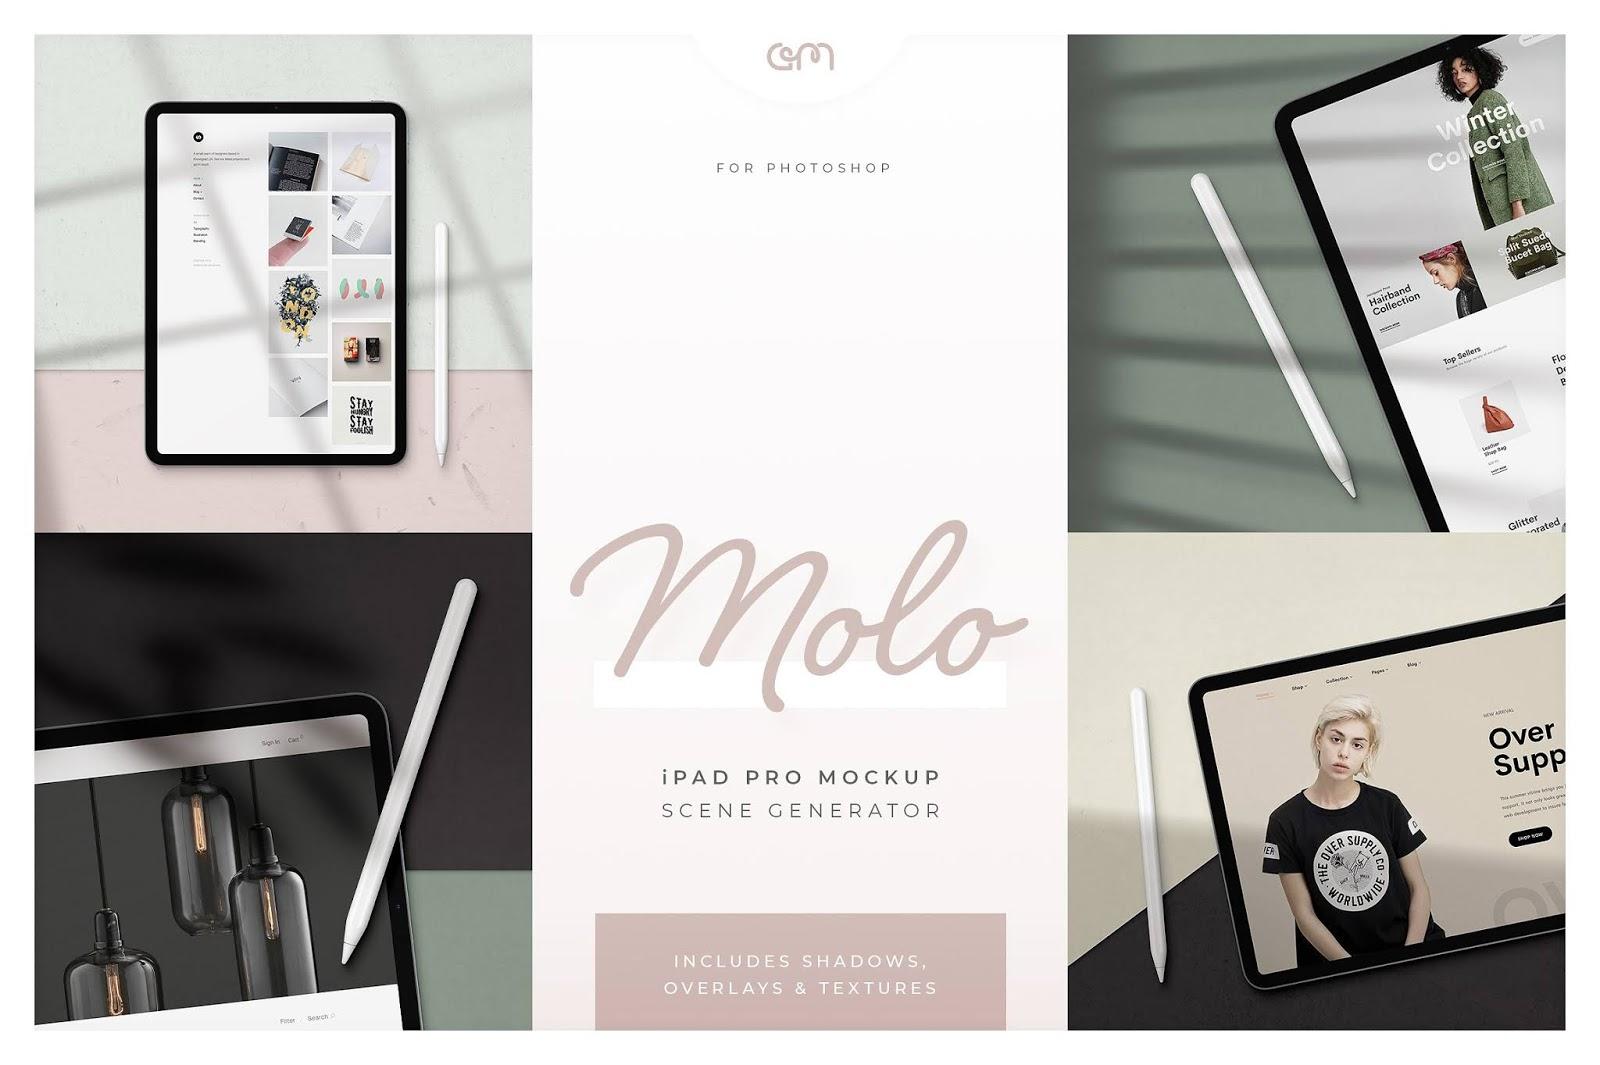 Molo iPad Pro Scene Creator